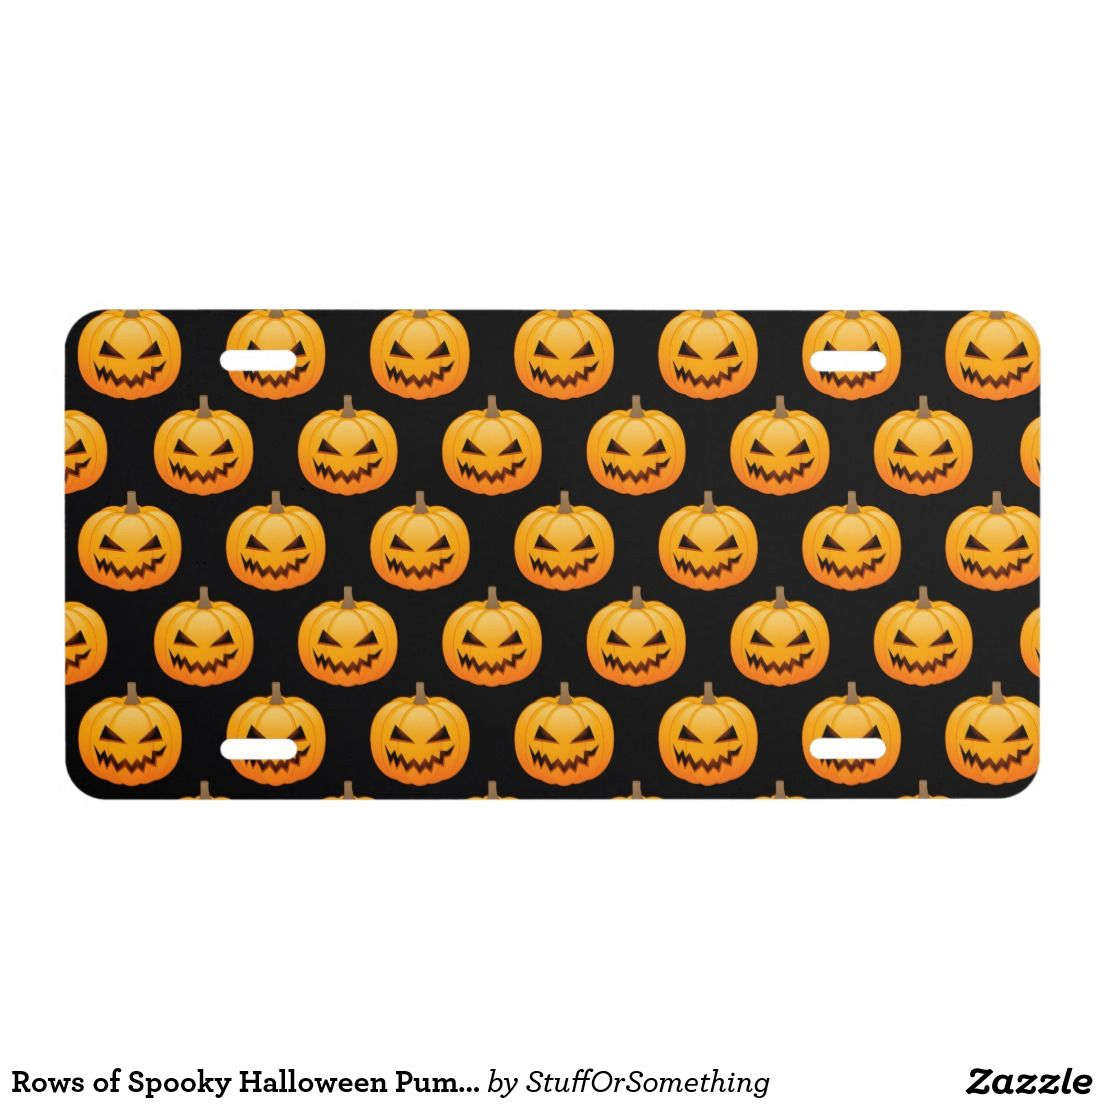 Rows of Spooky Halloween Pumpkins License Plate